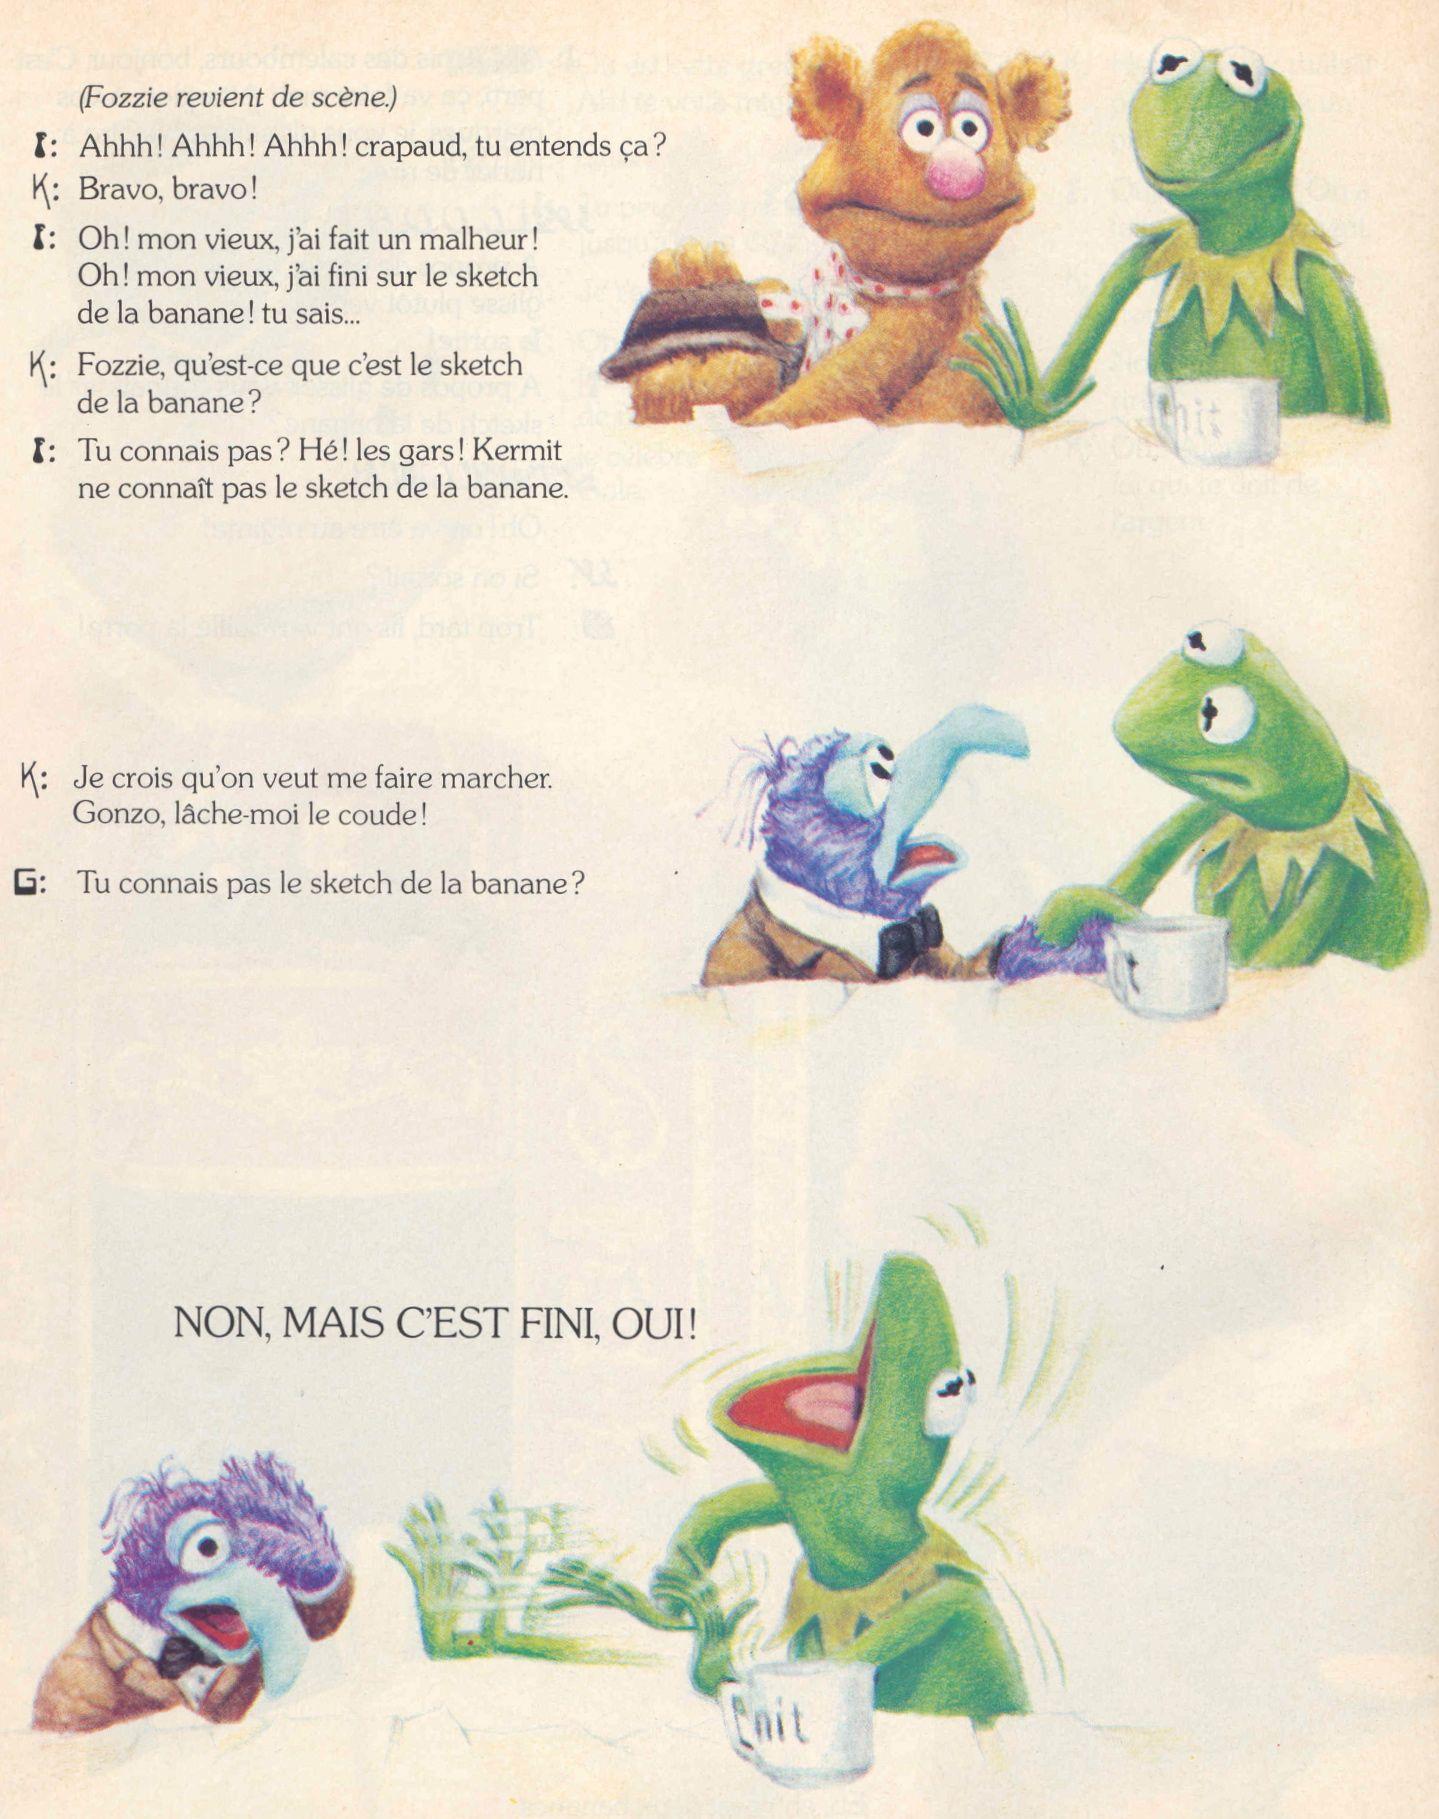 http://grenierdelatv.free.fr/2/muppetPif512janv197904.jpg